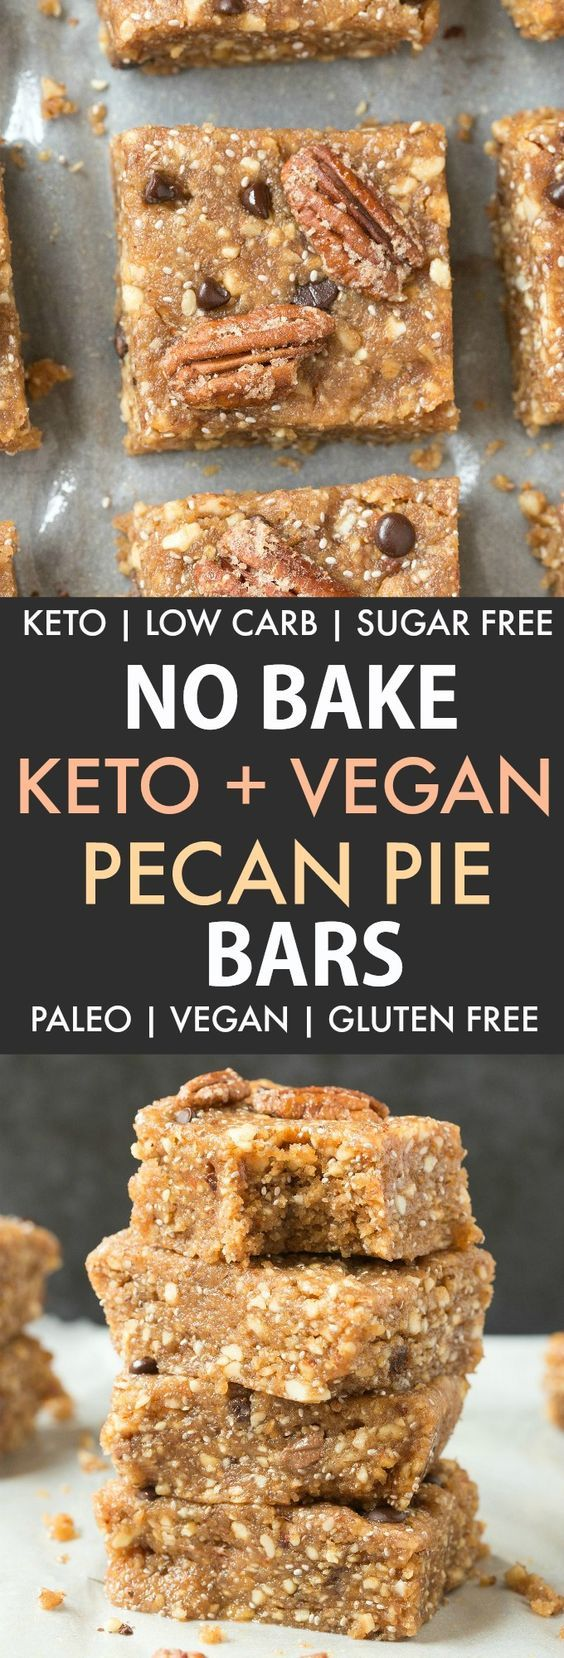 No Bake Paleo Vegan Pecan Pie Bars Lets Eat In 2019